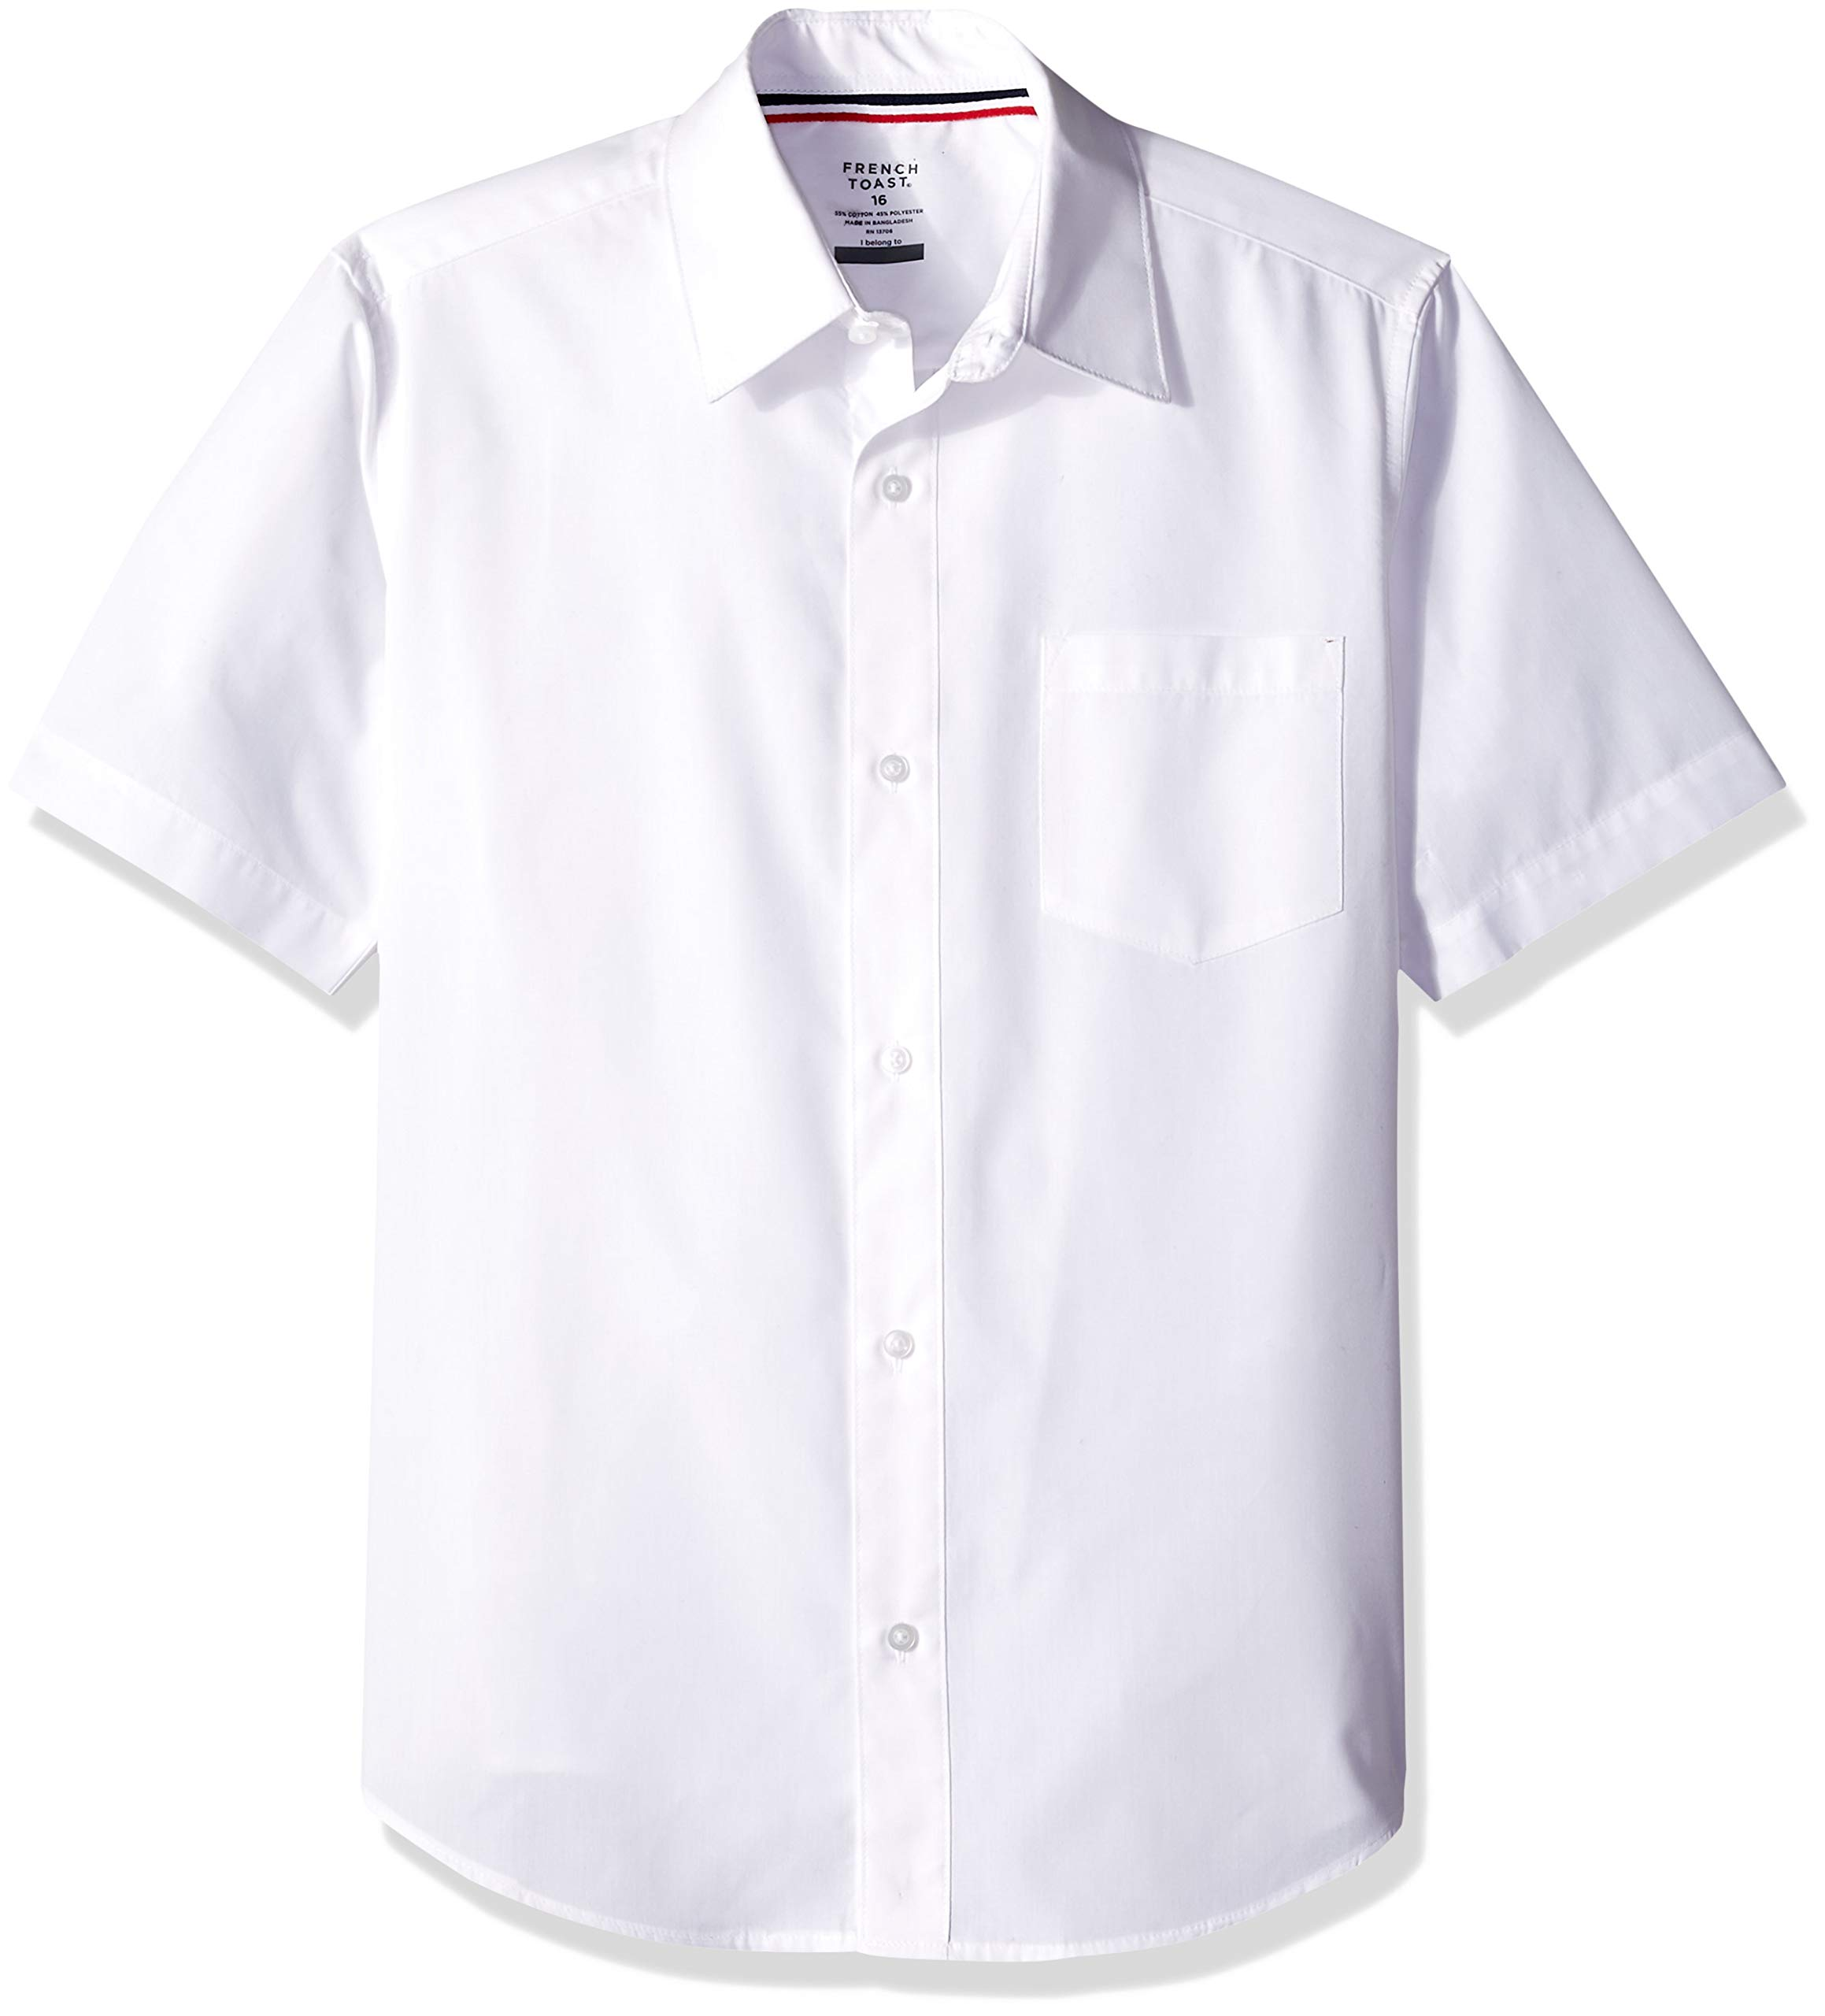 French Toast School Uniform Boys Short Sleeve Classic Dress Shirt, White, 10 Husky by French Toast (Image #1)